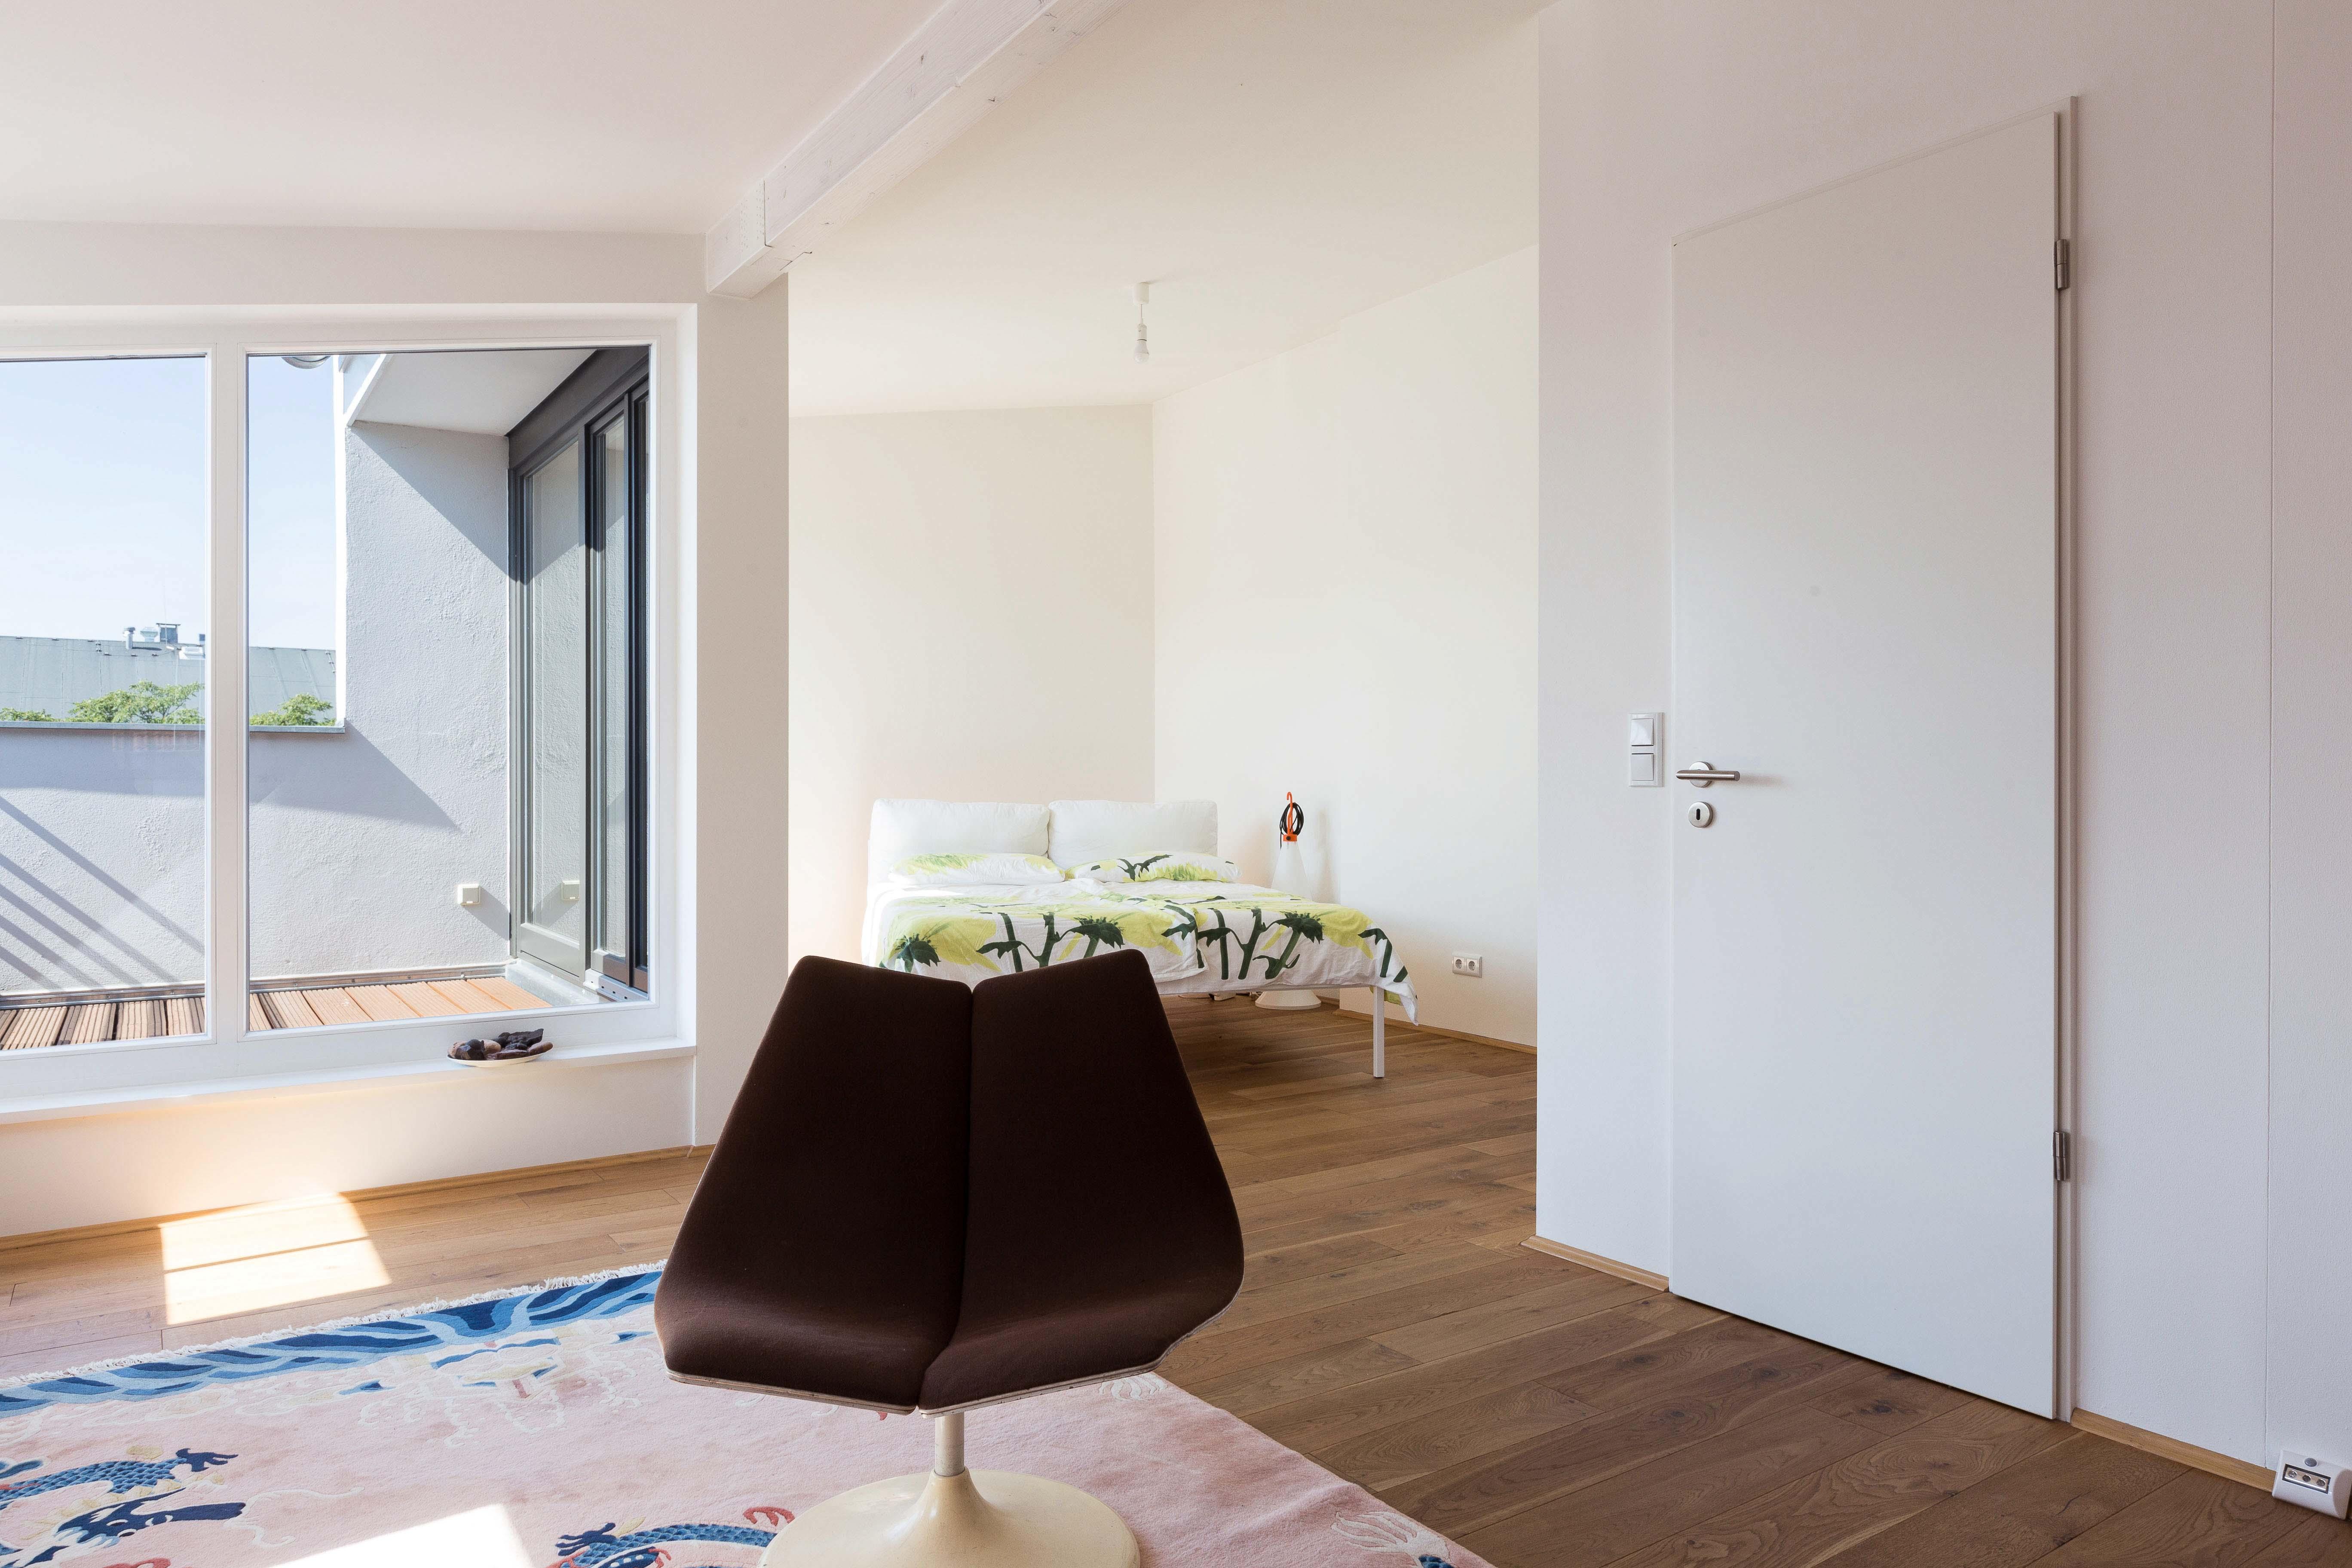 Interior Berlin interior design flats houses zanzibar berlin architecture